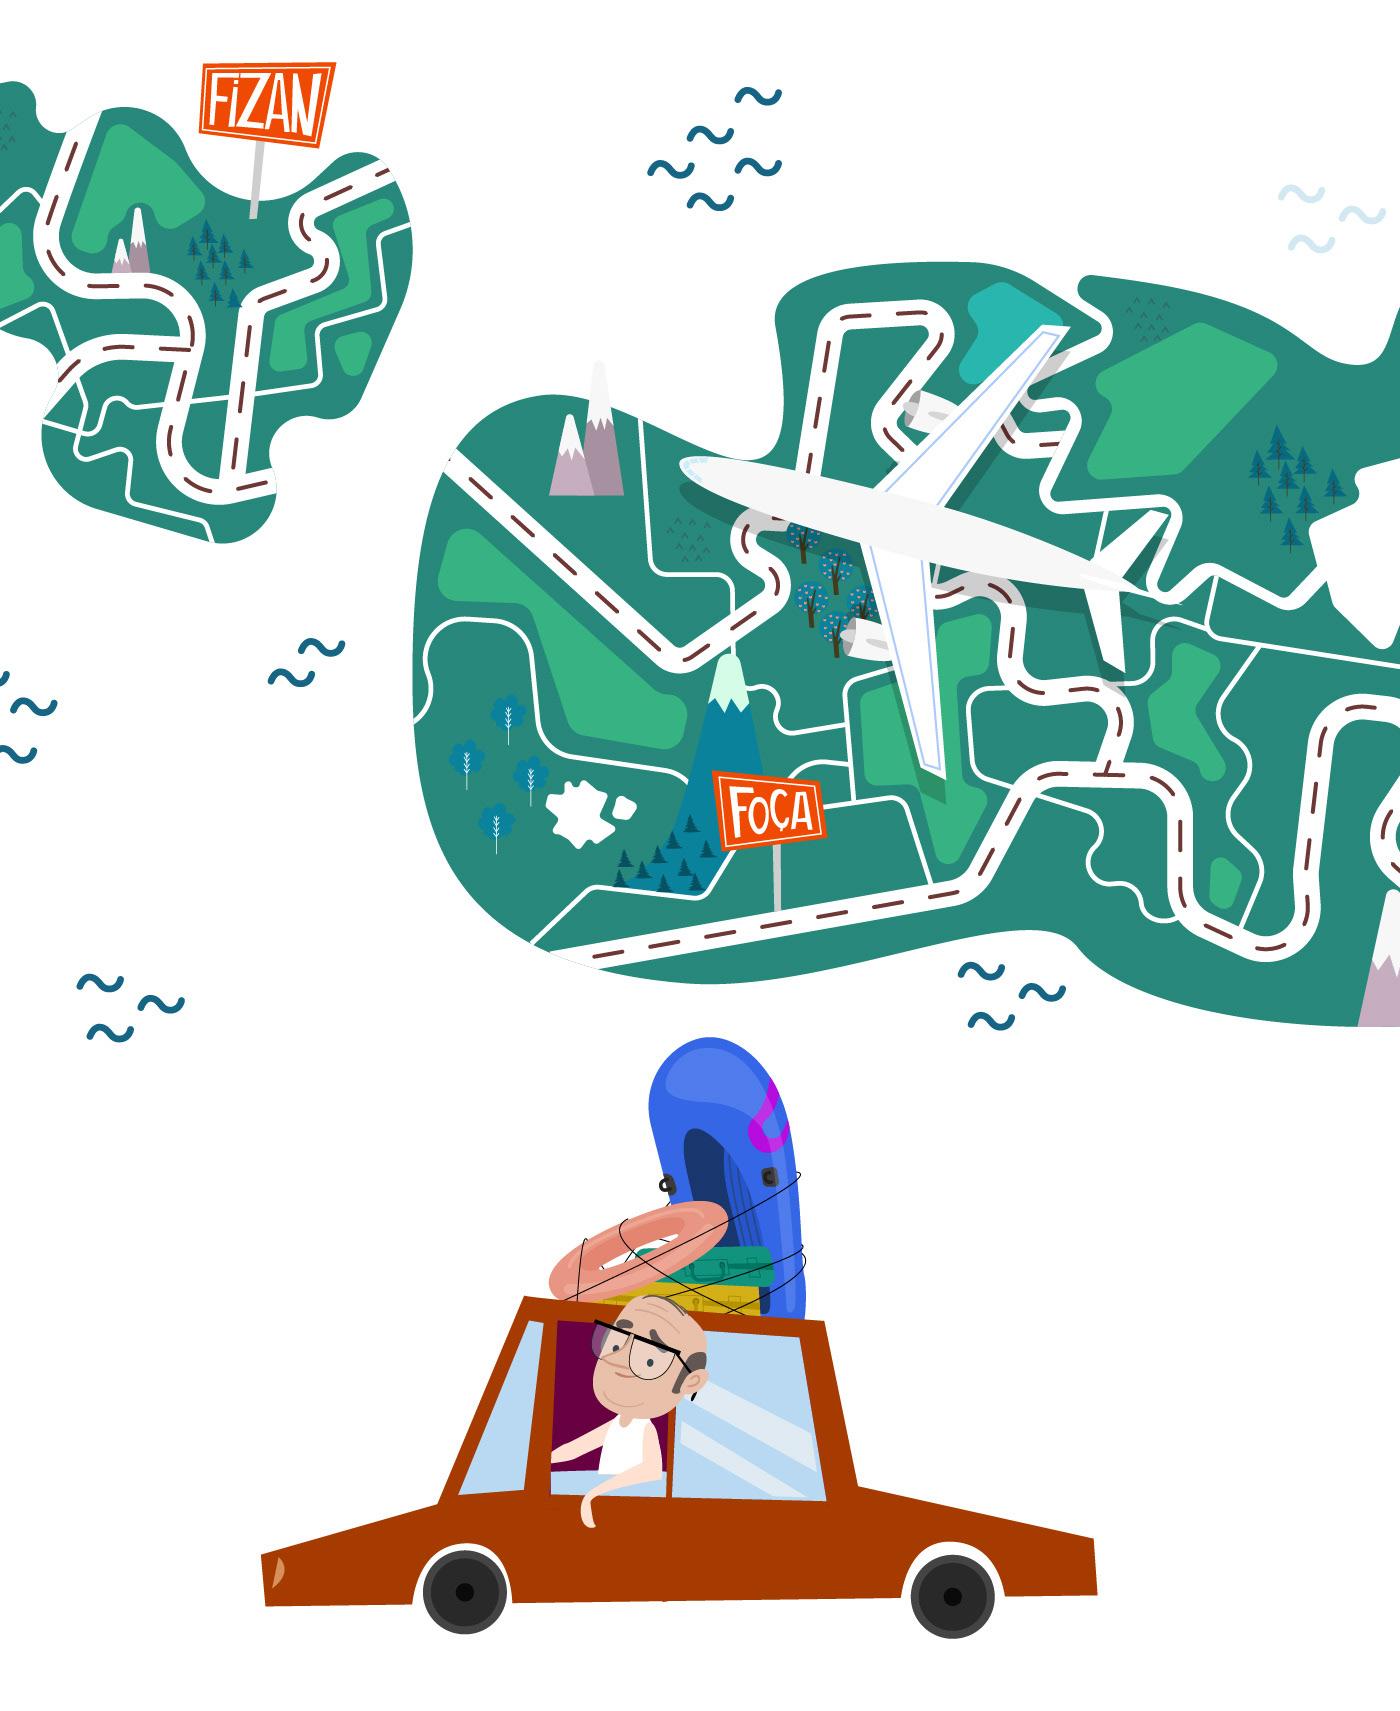 2D Animation character animation bkm BKM Express harçlık avı motion design Mobil App